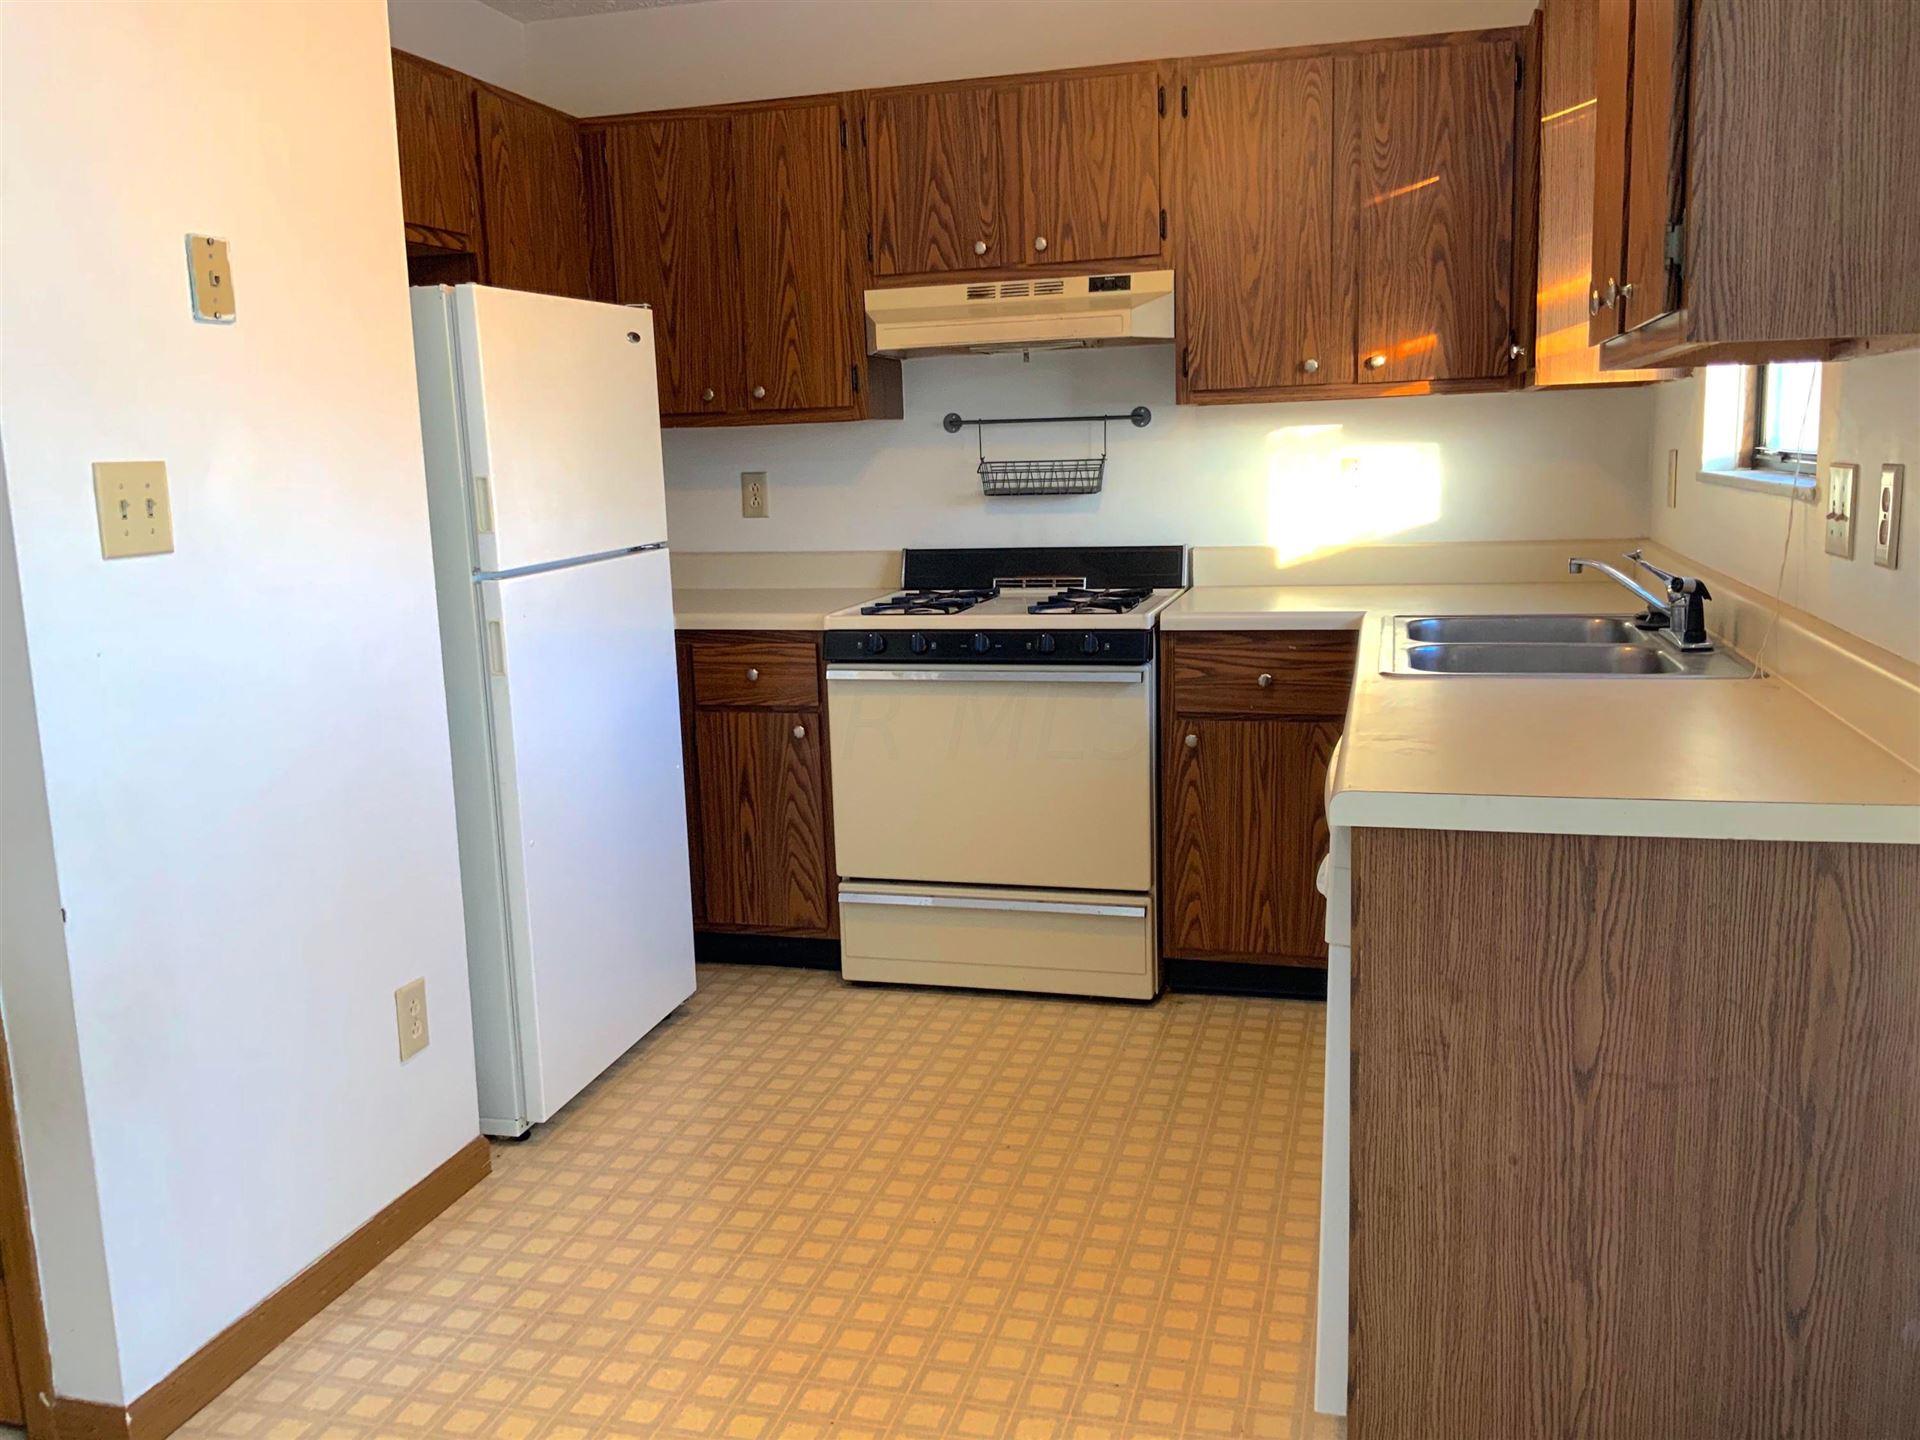 Photo of 869 Noddymill Lane E #32D, Worthington, OH 43085 (MLS # 221003579)